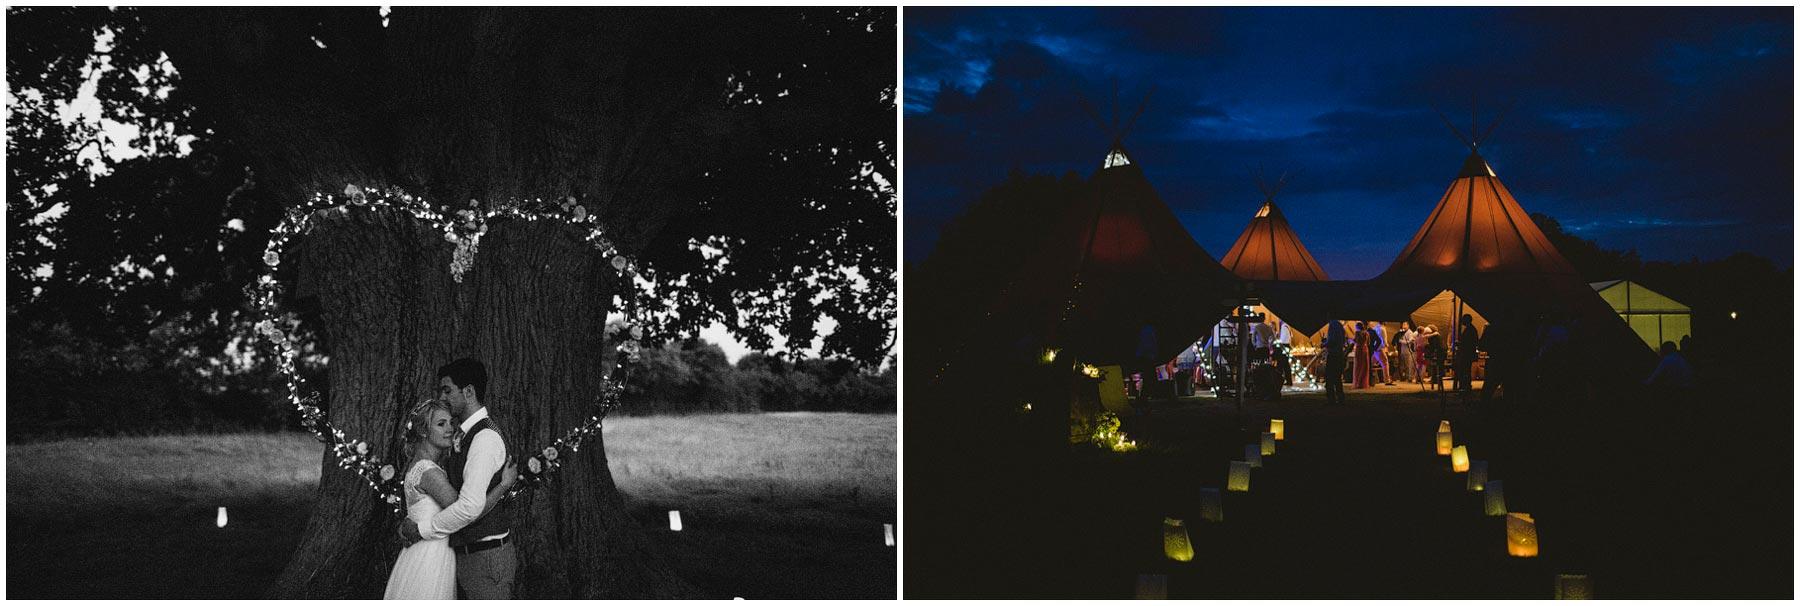 Kent-Festival-Tipi-wedding-photography_0189